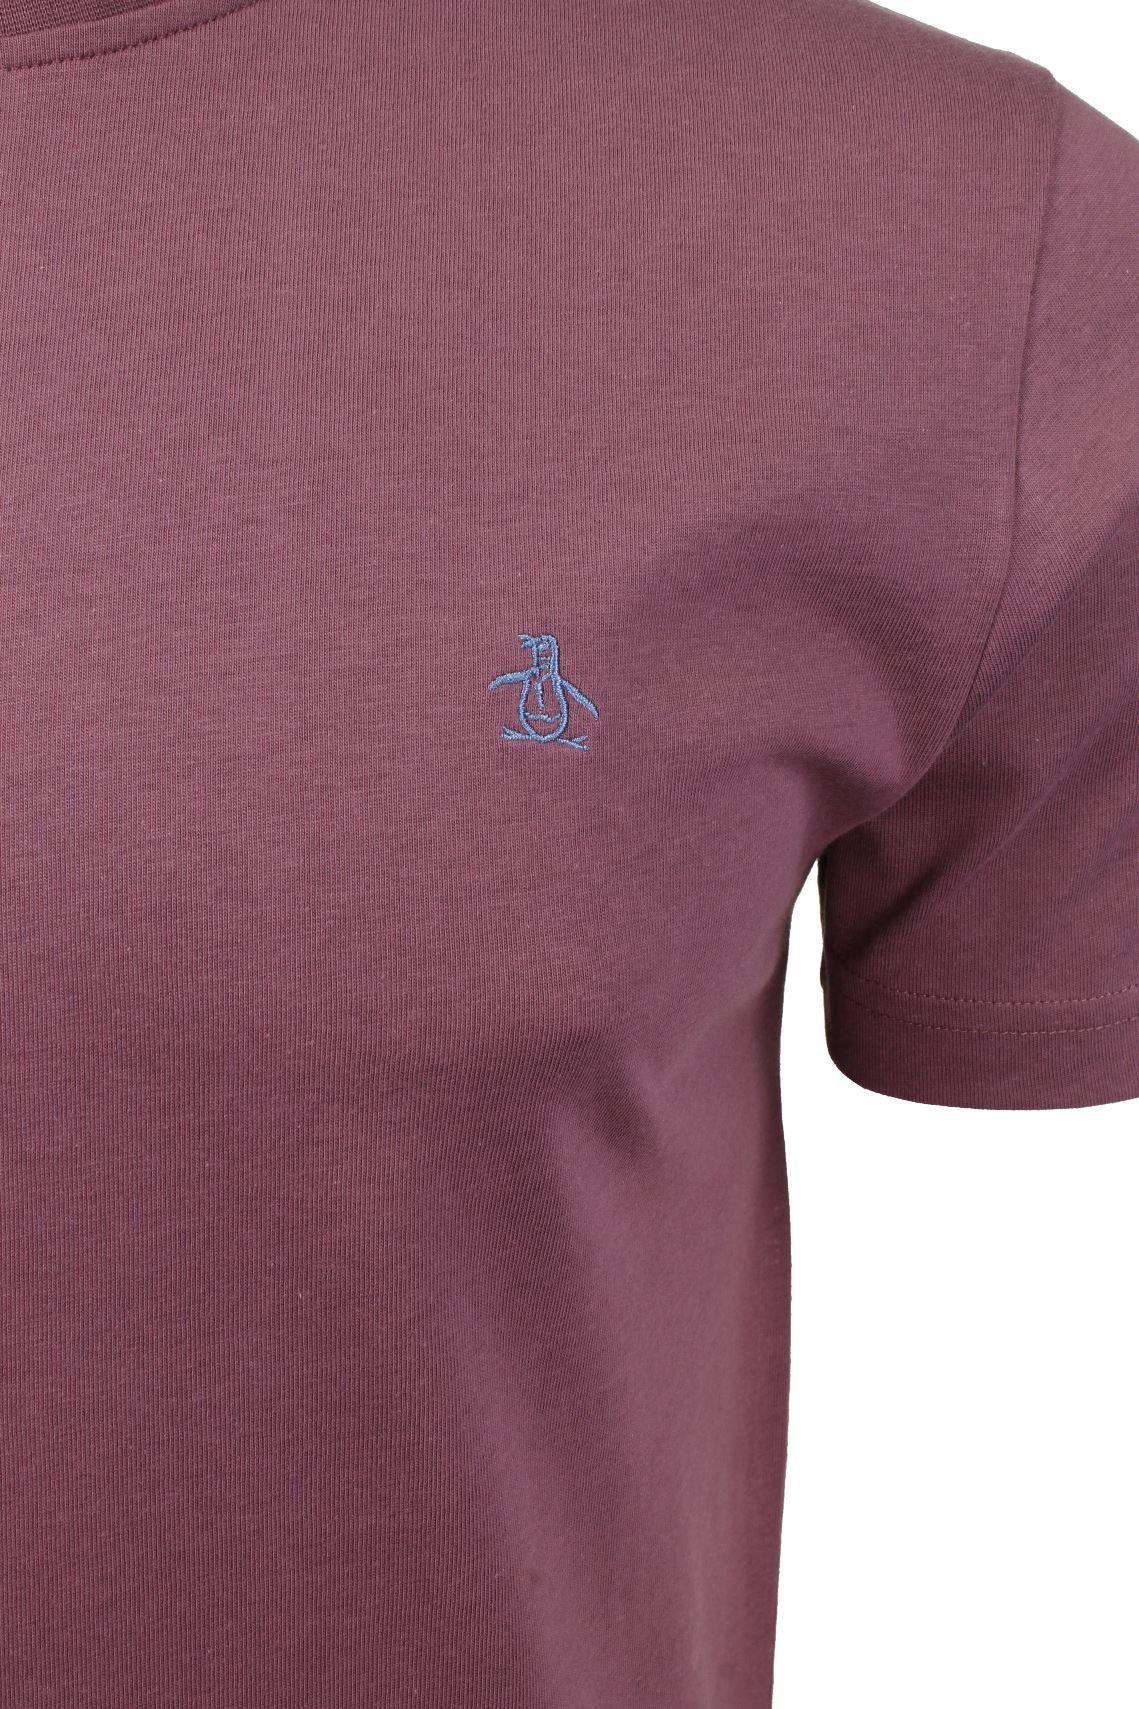 Mens-T-Shirt-by-Original-Penguin-Crew-Neck-Short-Sleeved thumbnail 34